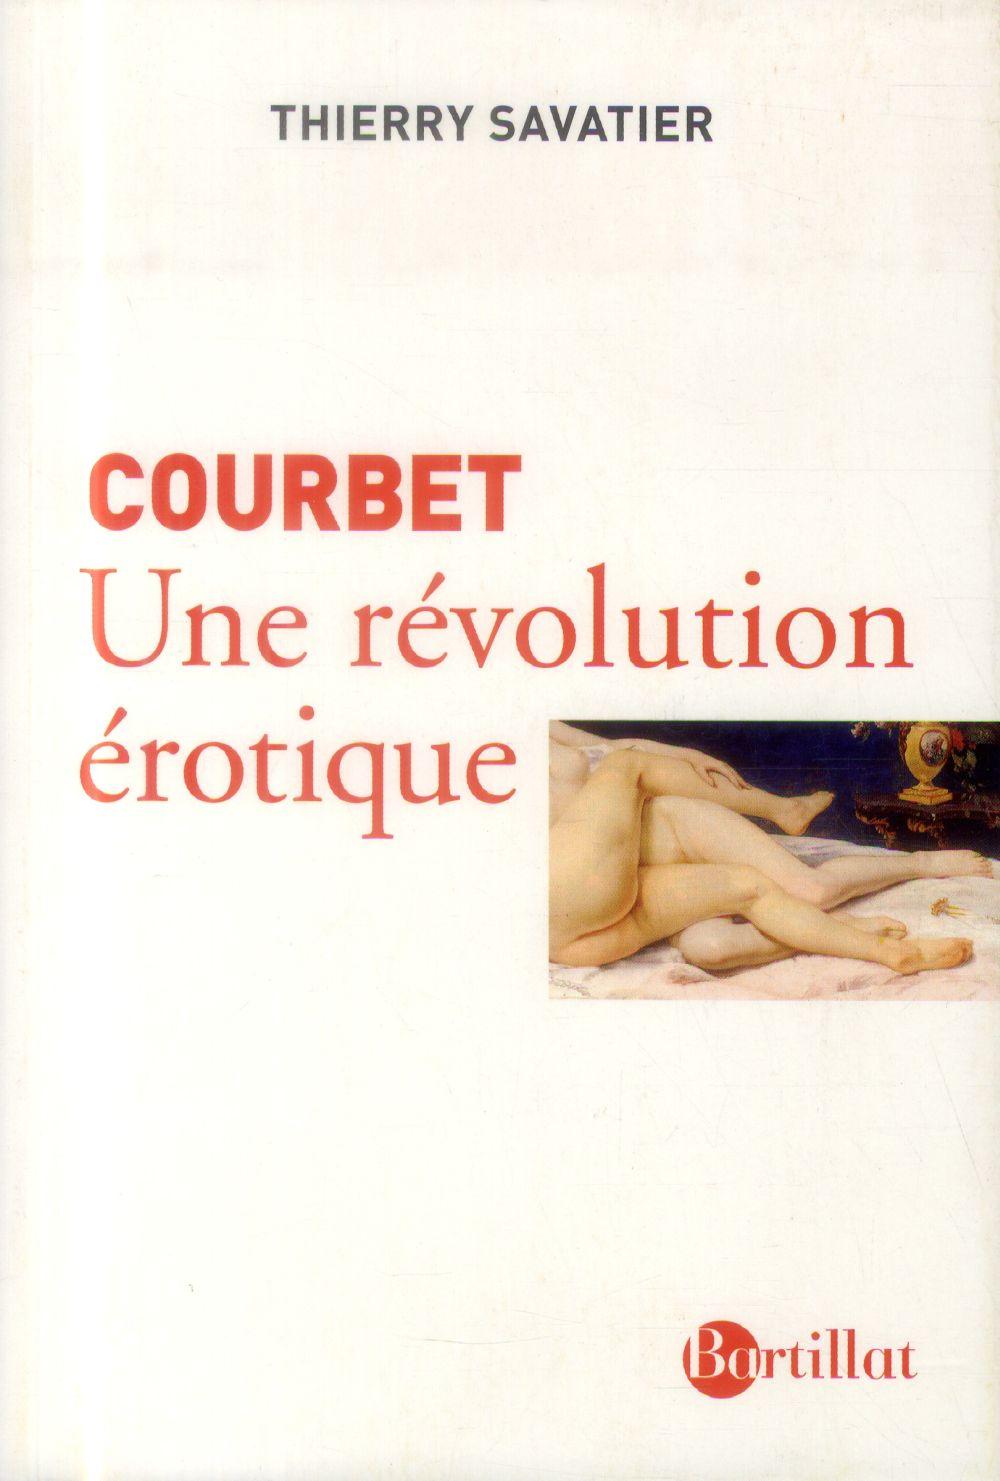 COURBET UNE REVOLUTION EROTIQUE